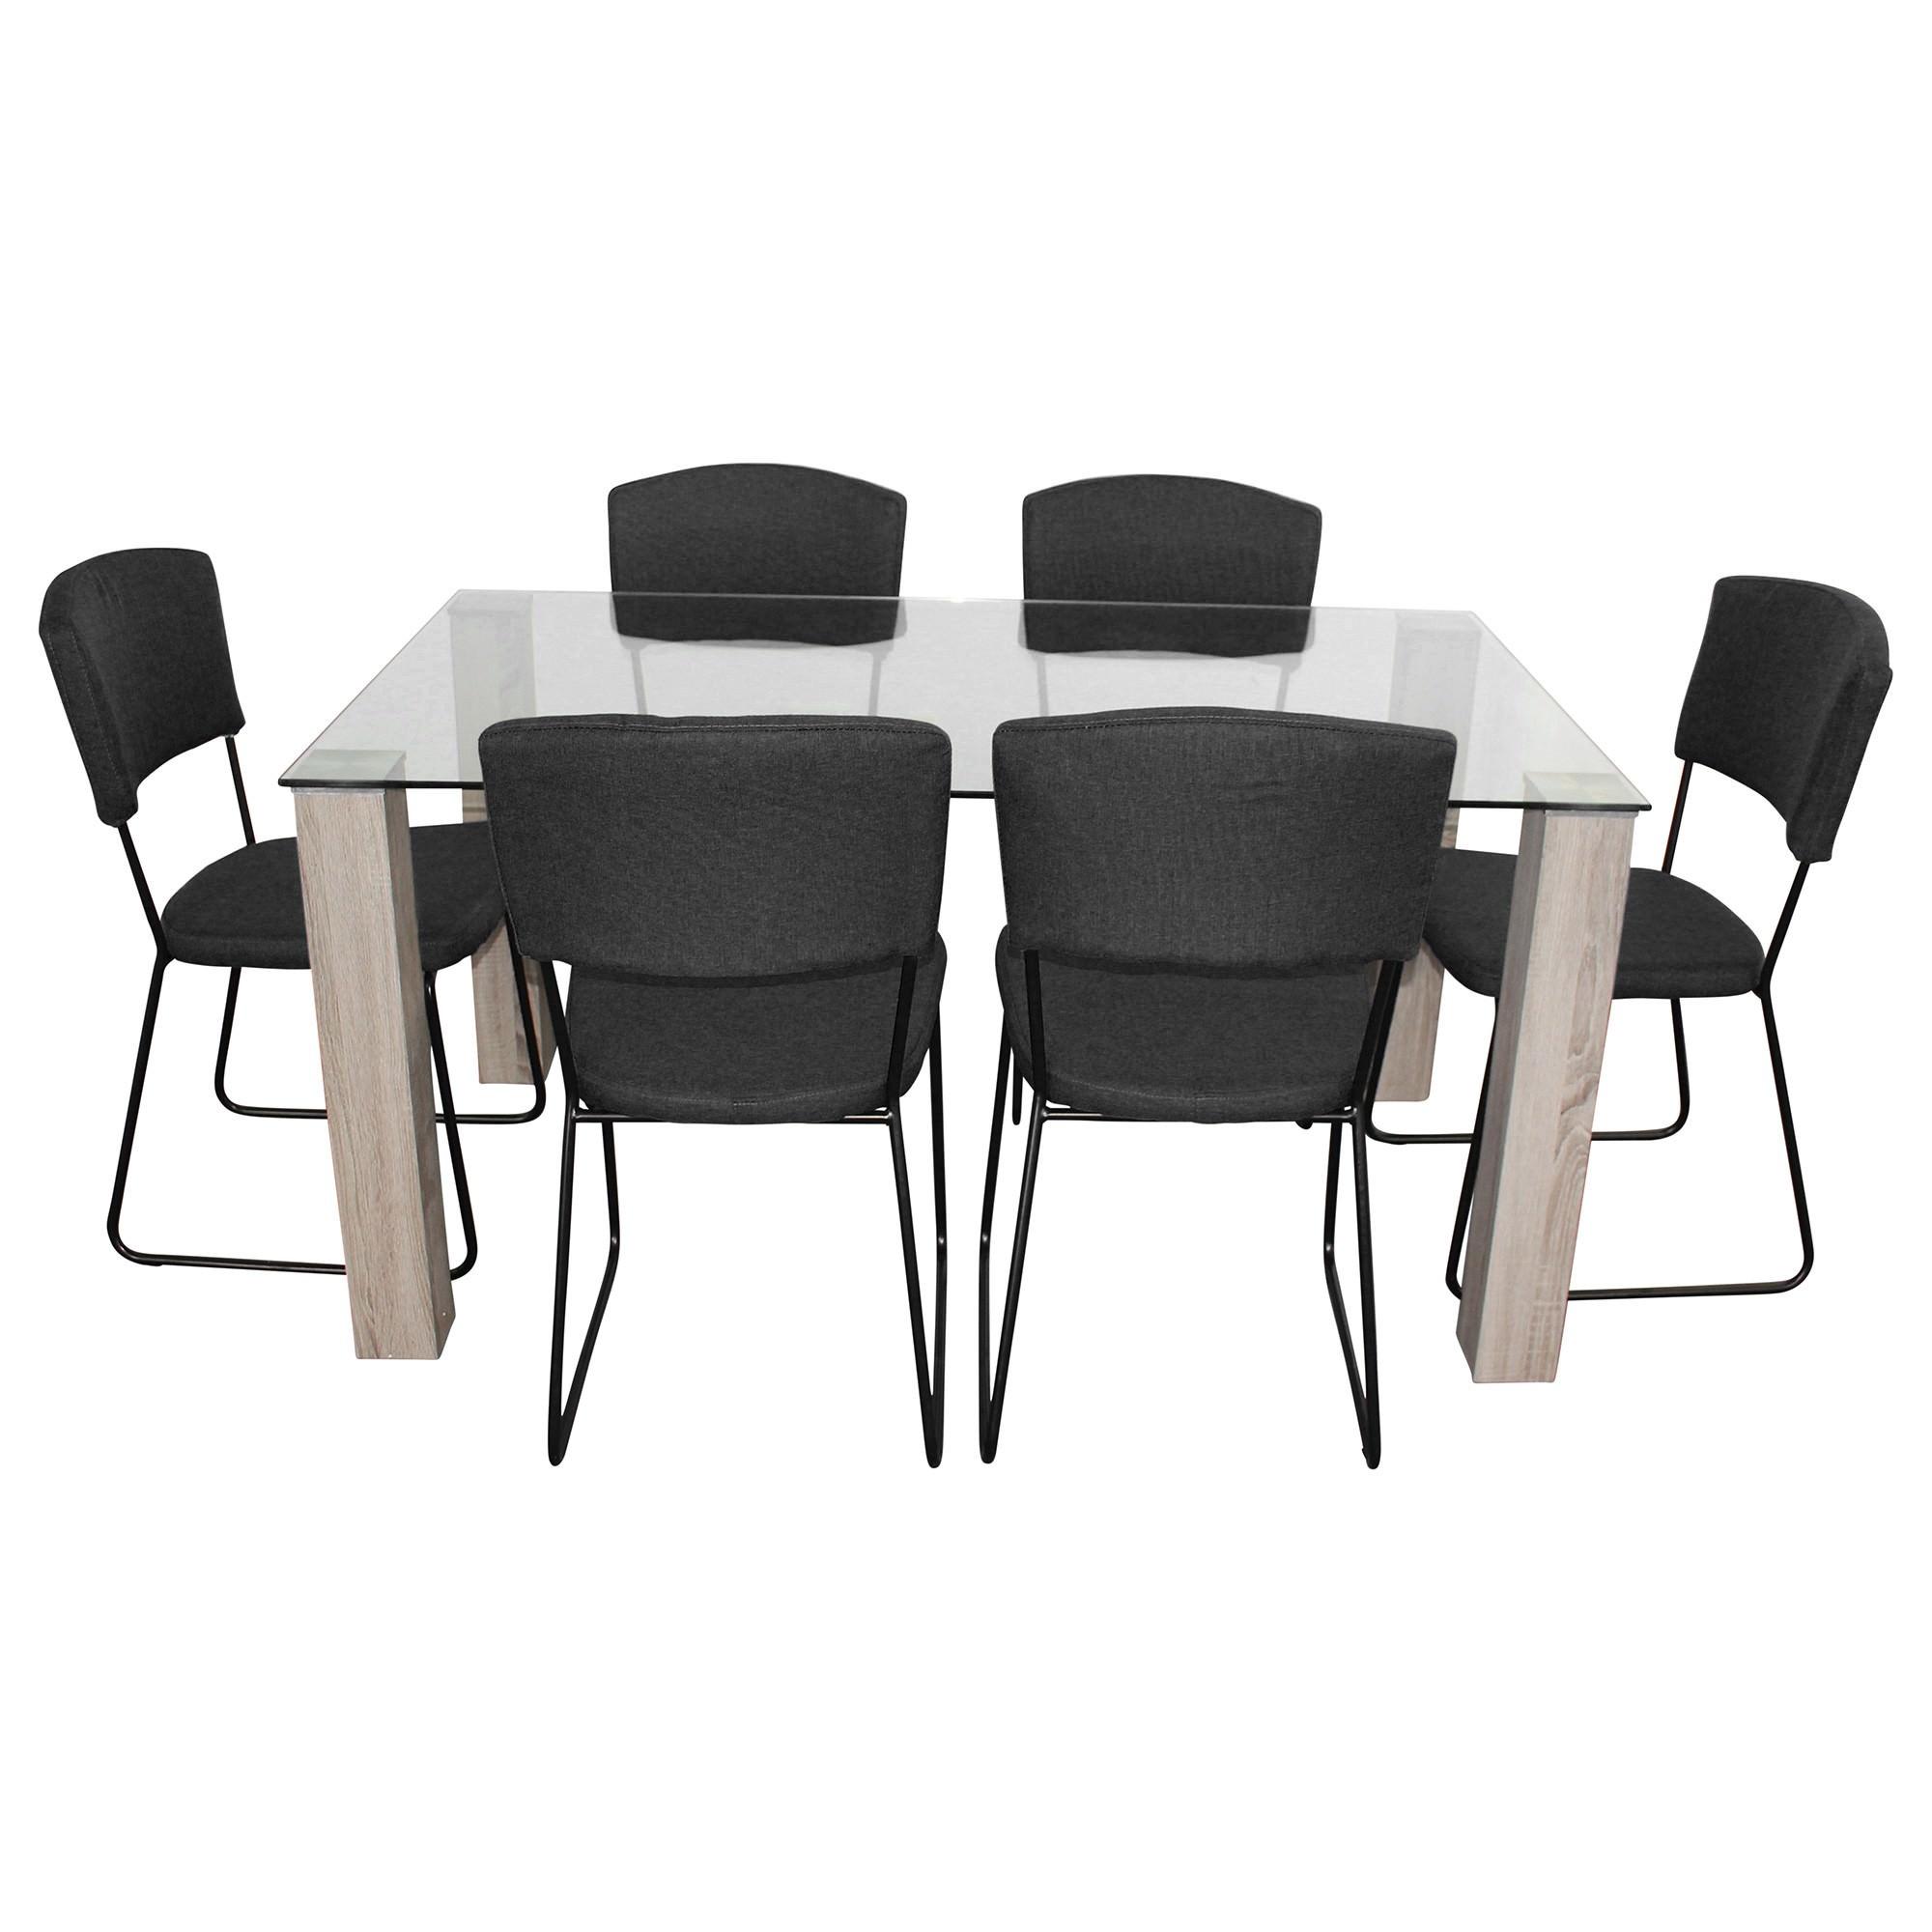 Emilio 7 Piece Glass Top Dining Table Set, 160cm, Black Arezzo Chair